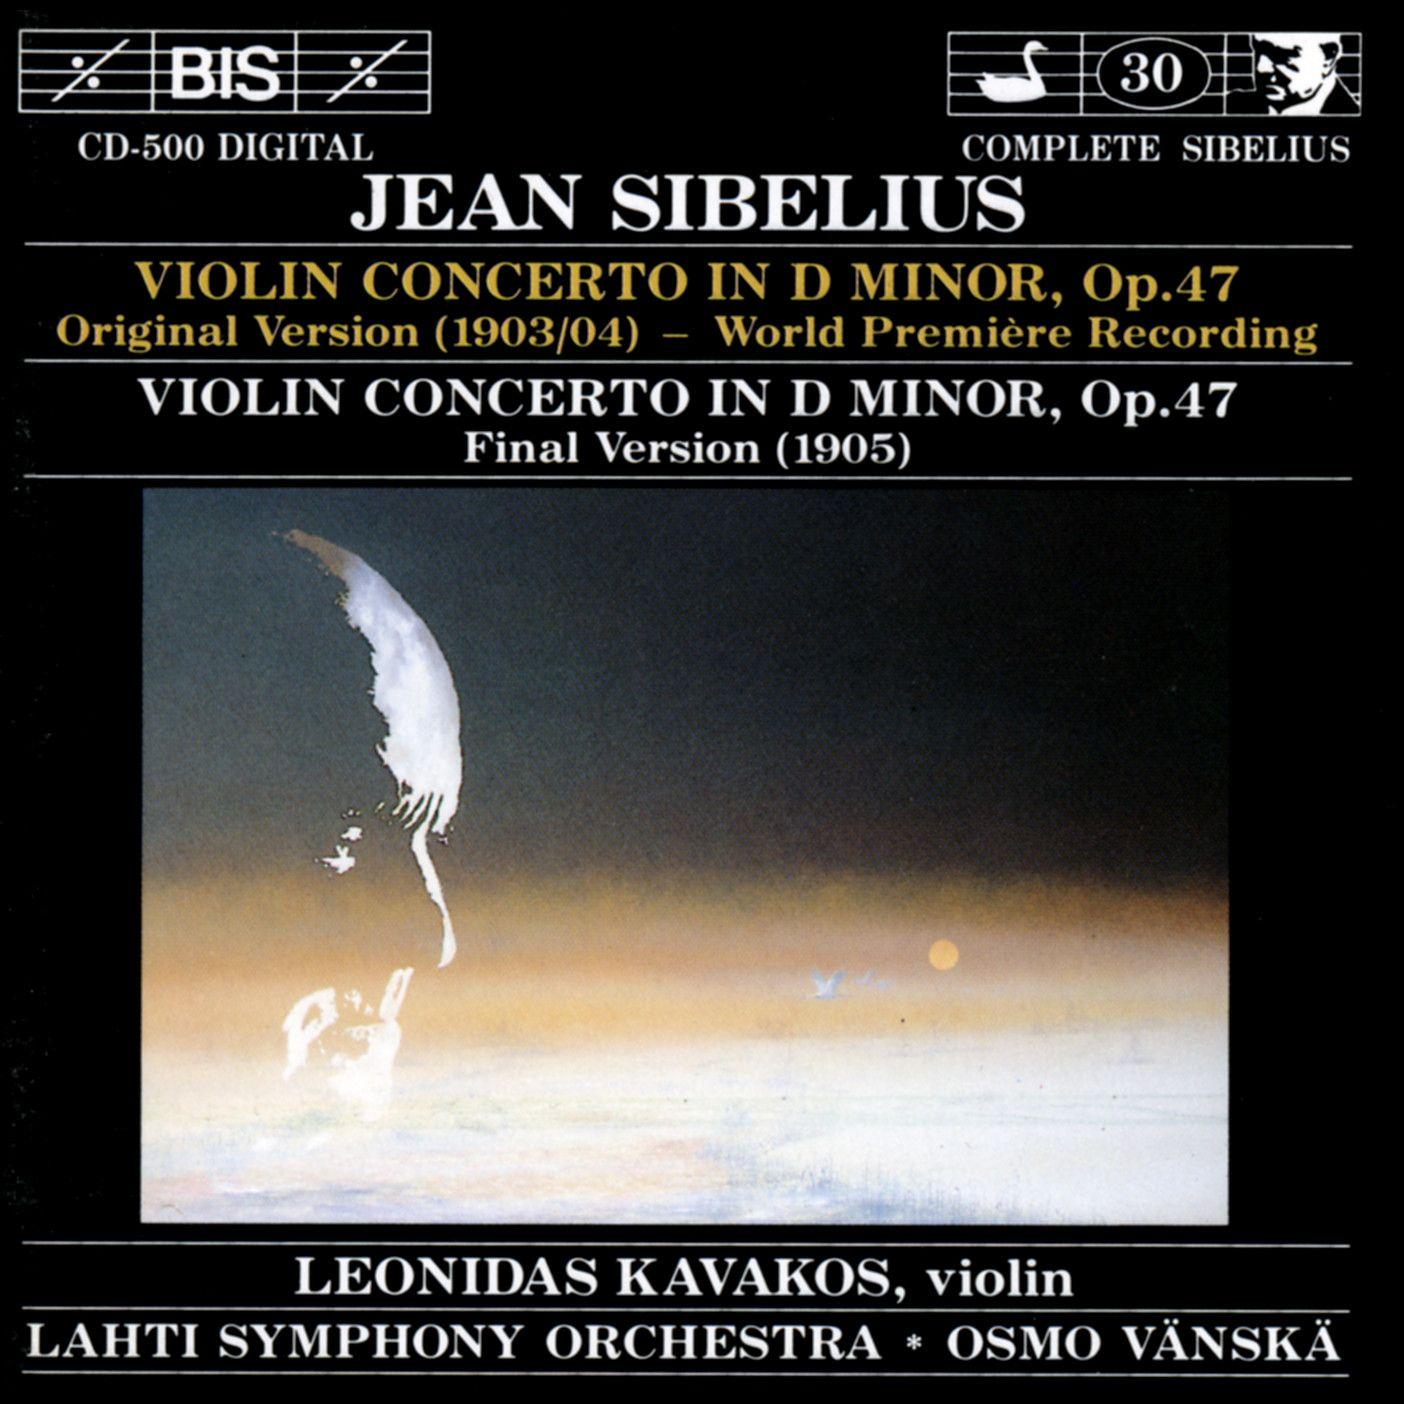 Leonidas Kavakos; Lahti Symphony Orchestra / Osmo Vänskä // BIS BIS-CD-500 - Recorded 1990